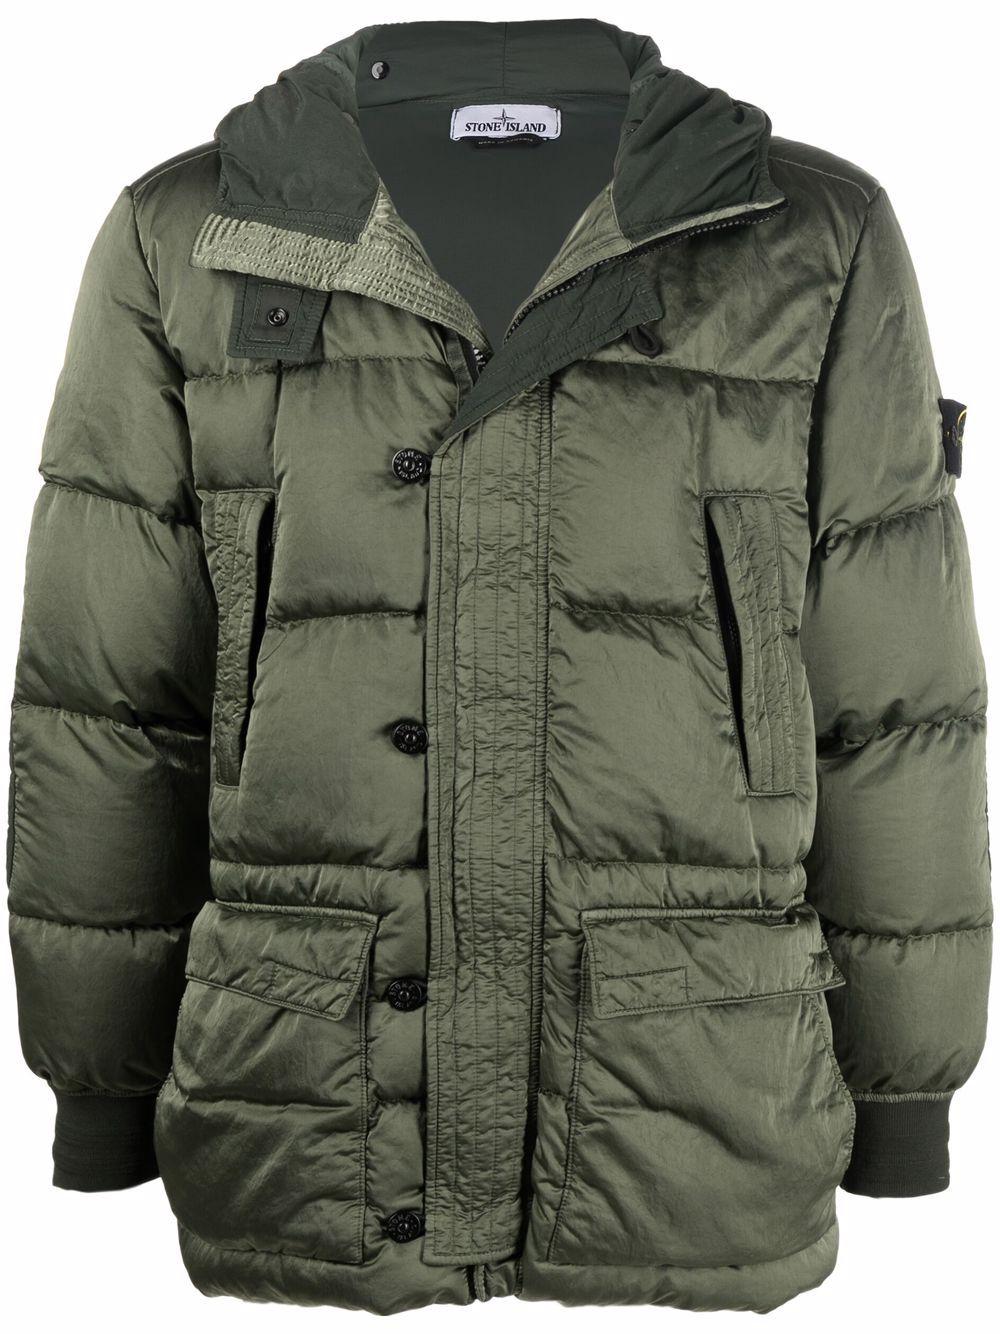 <p class='small-title'>STONE ISLAND</p>Puffer Jacket